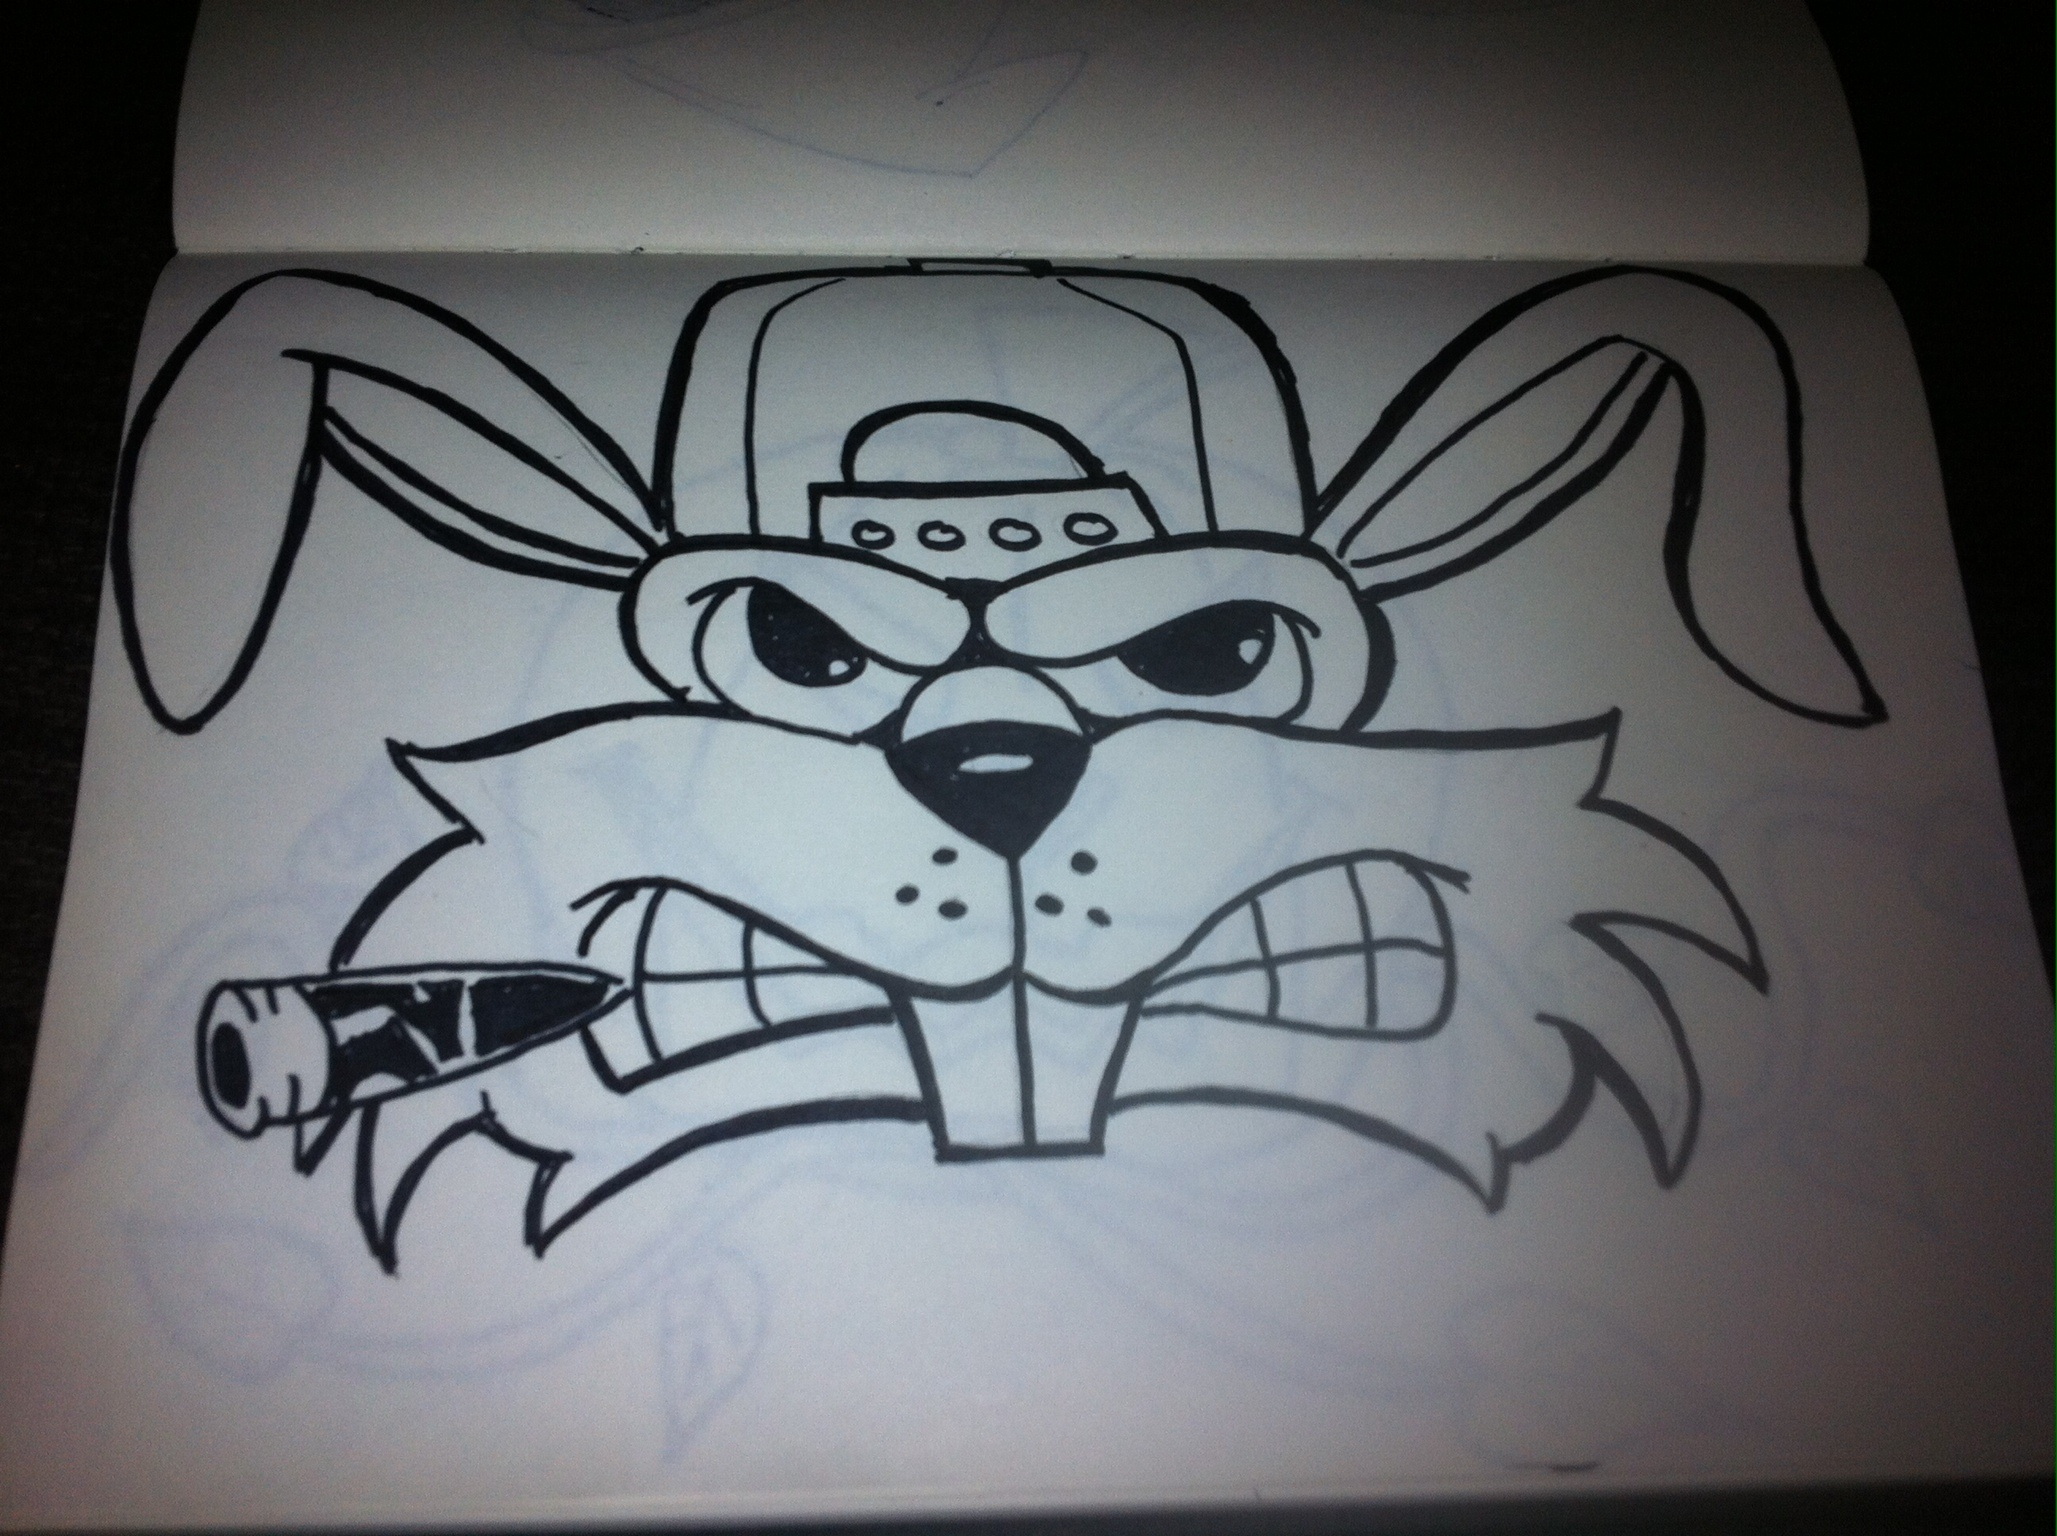 2057x1536 Gangster Graffiti Cartoon Gangster Animals Drawings